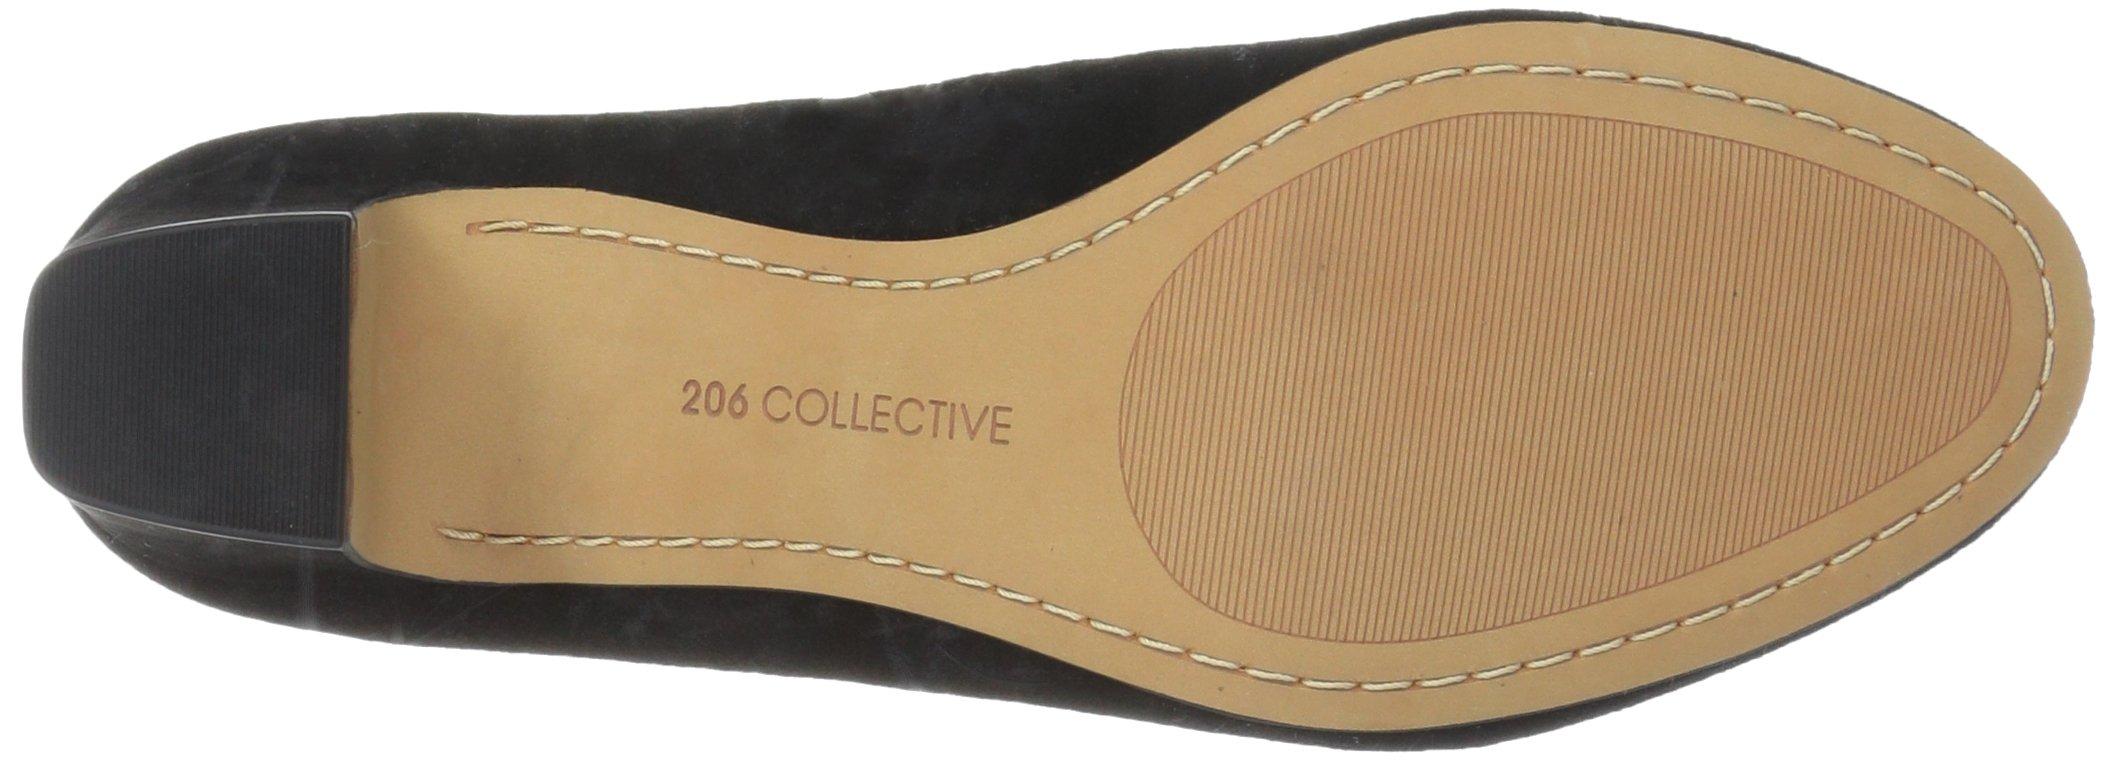 206 Collective Women's Merritt Round Toe Block Heel Low Pump, Black Suede, 7.5 B US by 206 Collective (Image #3)